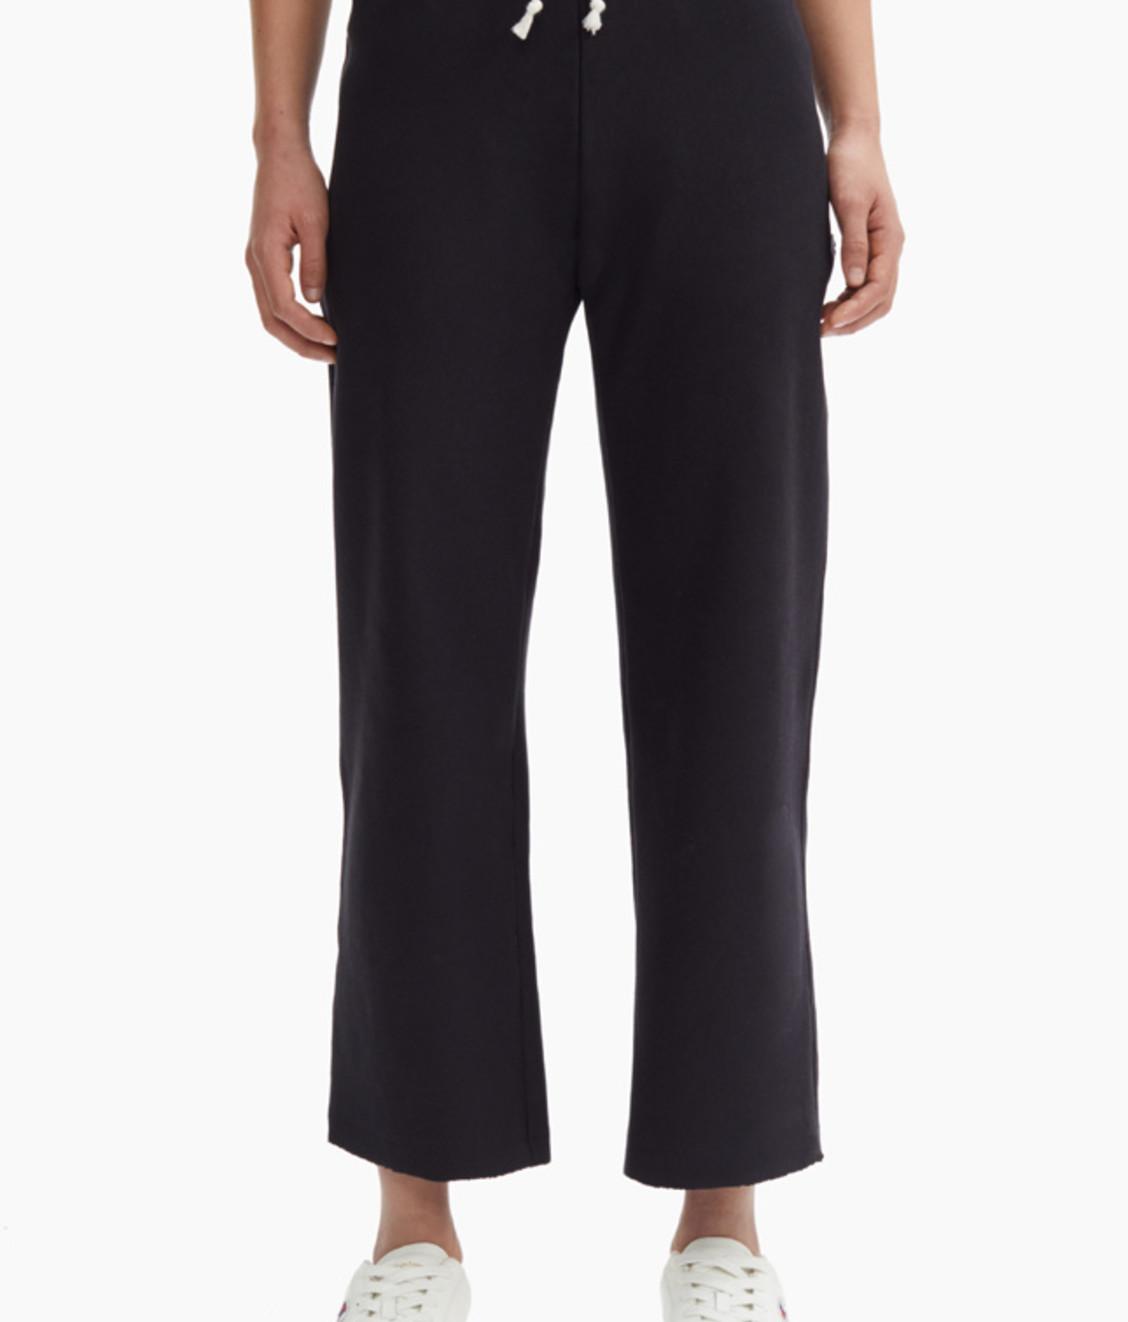 Champion Champion Reverse Weave 7/8 Pants Black